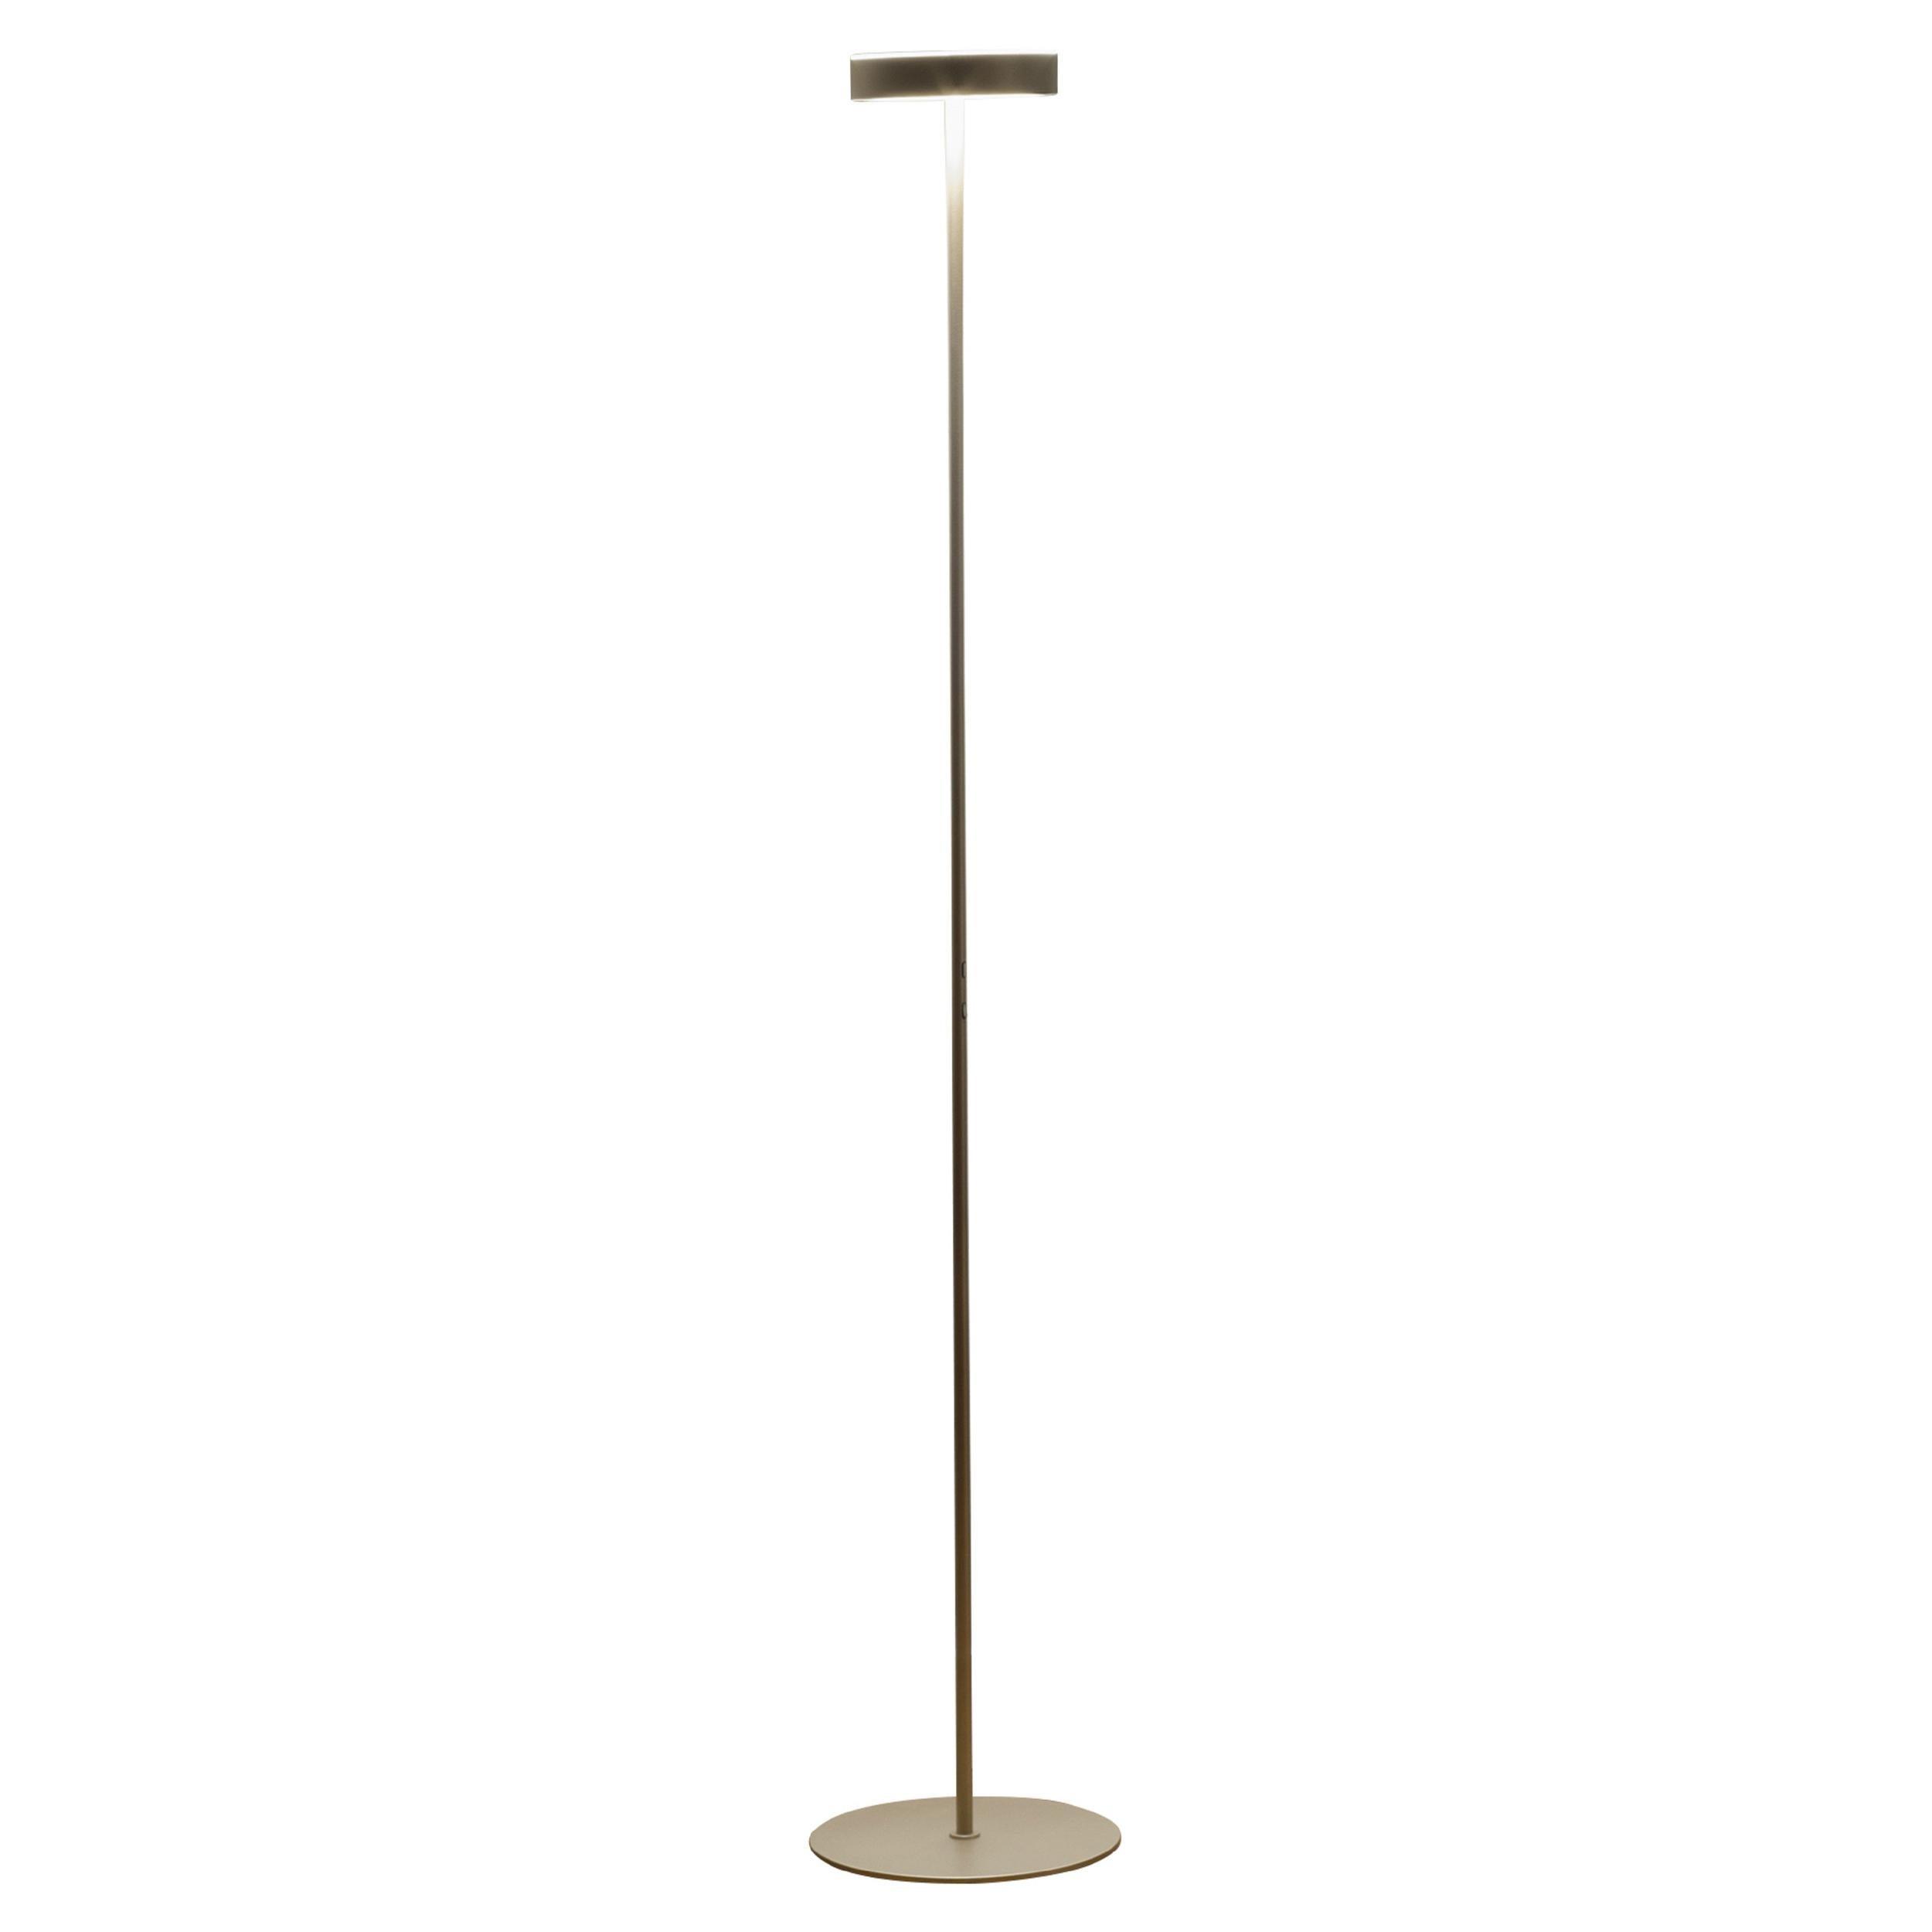 Firmamento Milano Tambu LED Floor Lamp in Gold by Carlo Guglielmi